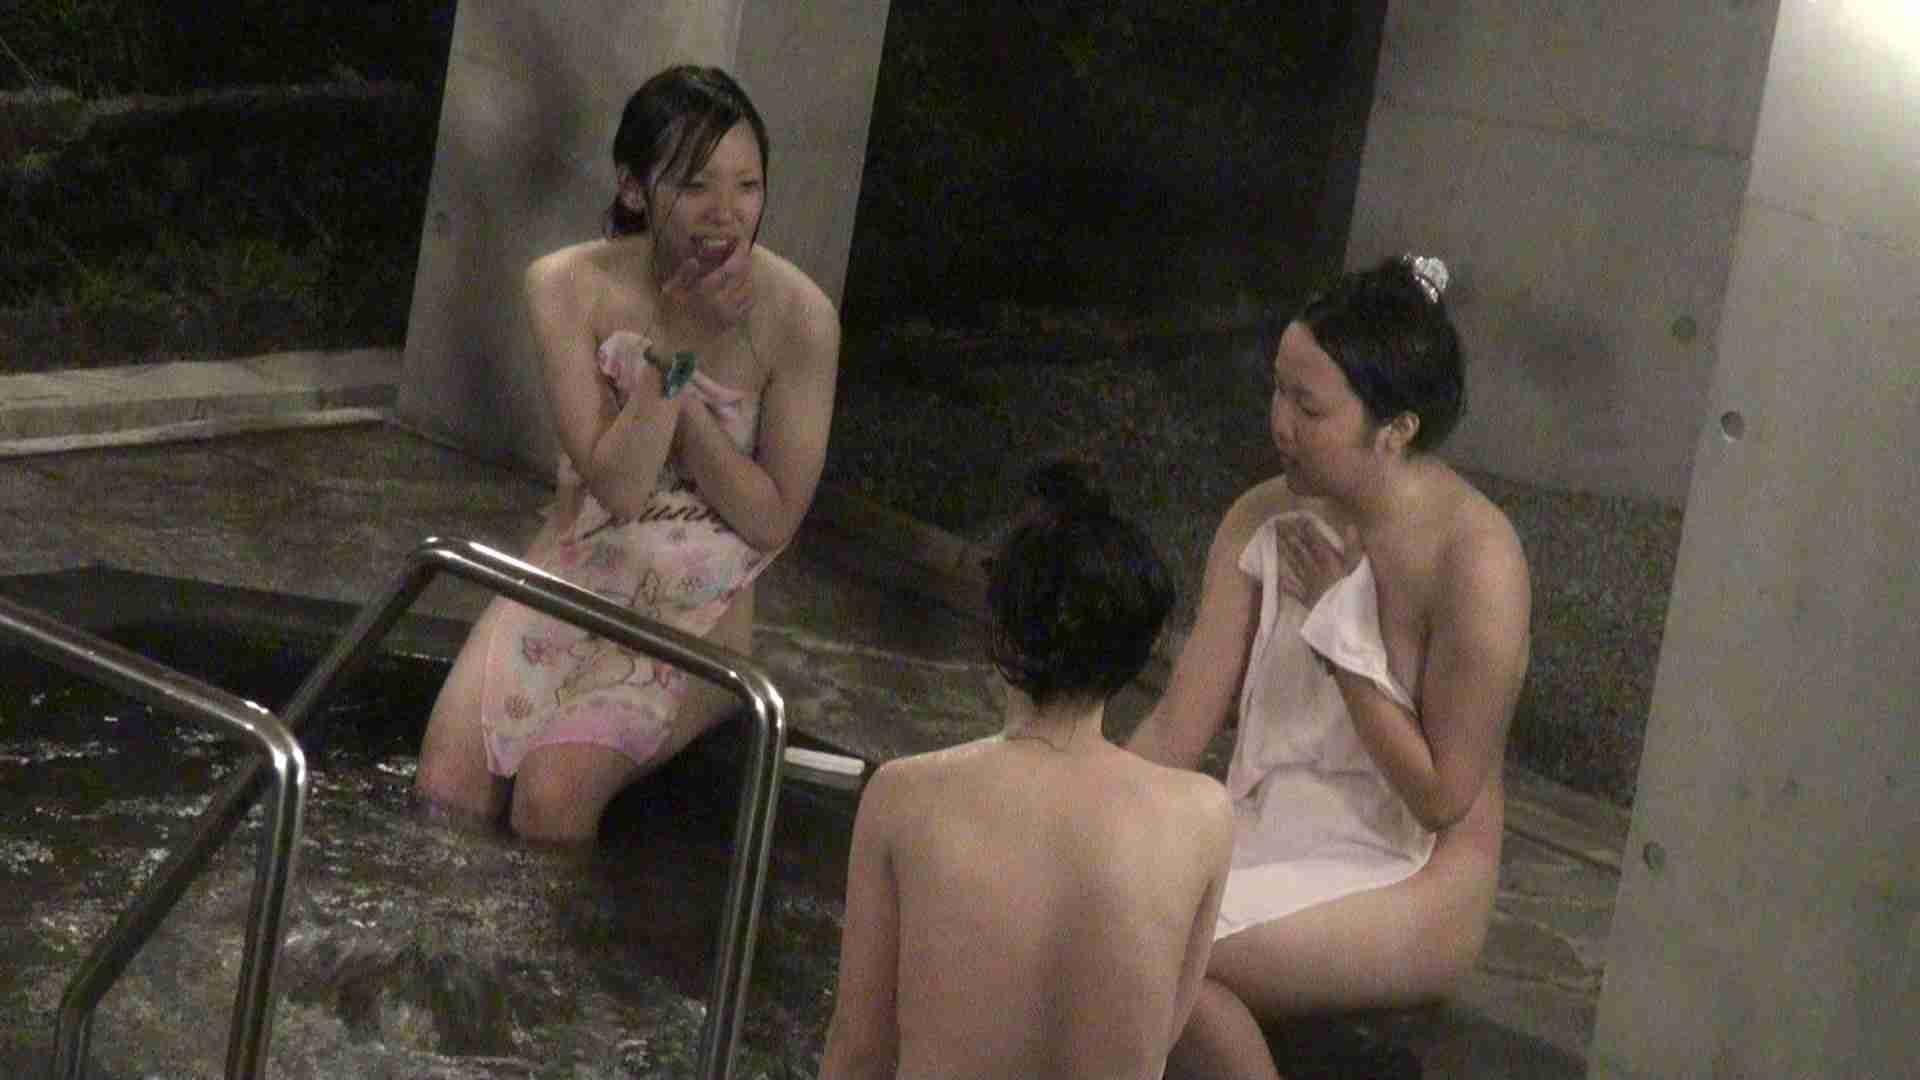 Aquaな露天風呂Vol.383 OLセックス 覗き性交動画流出 103画像 77